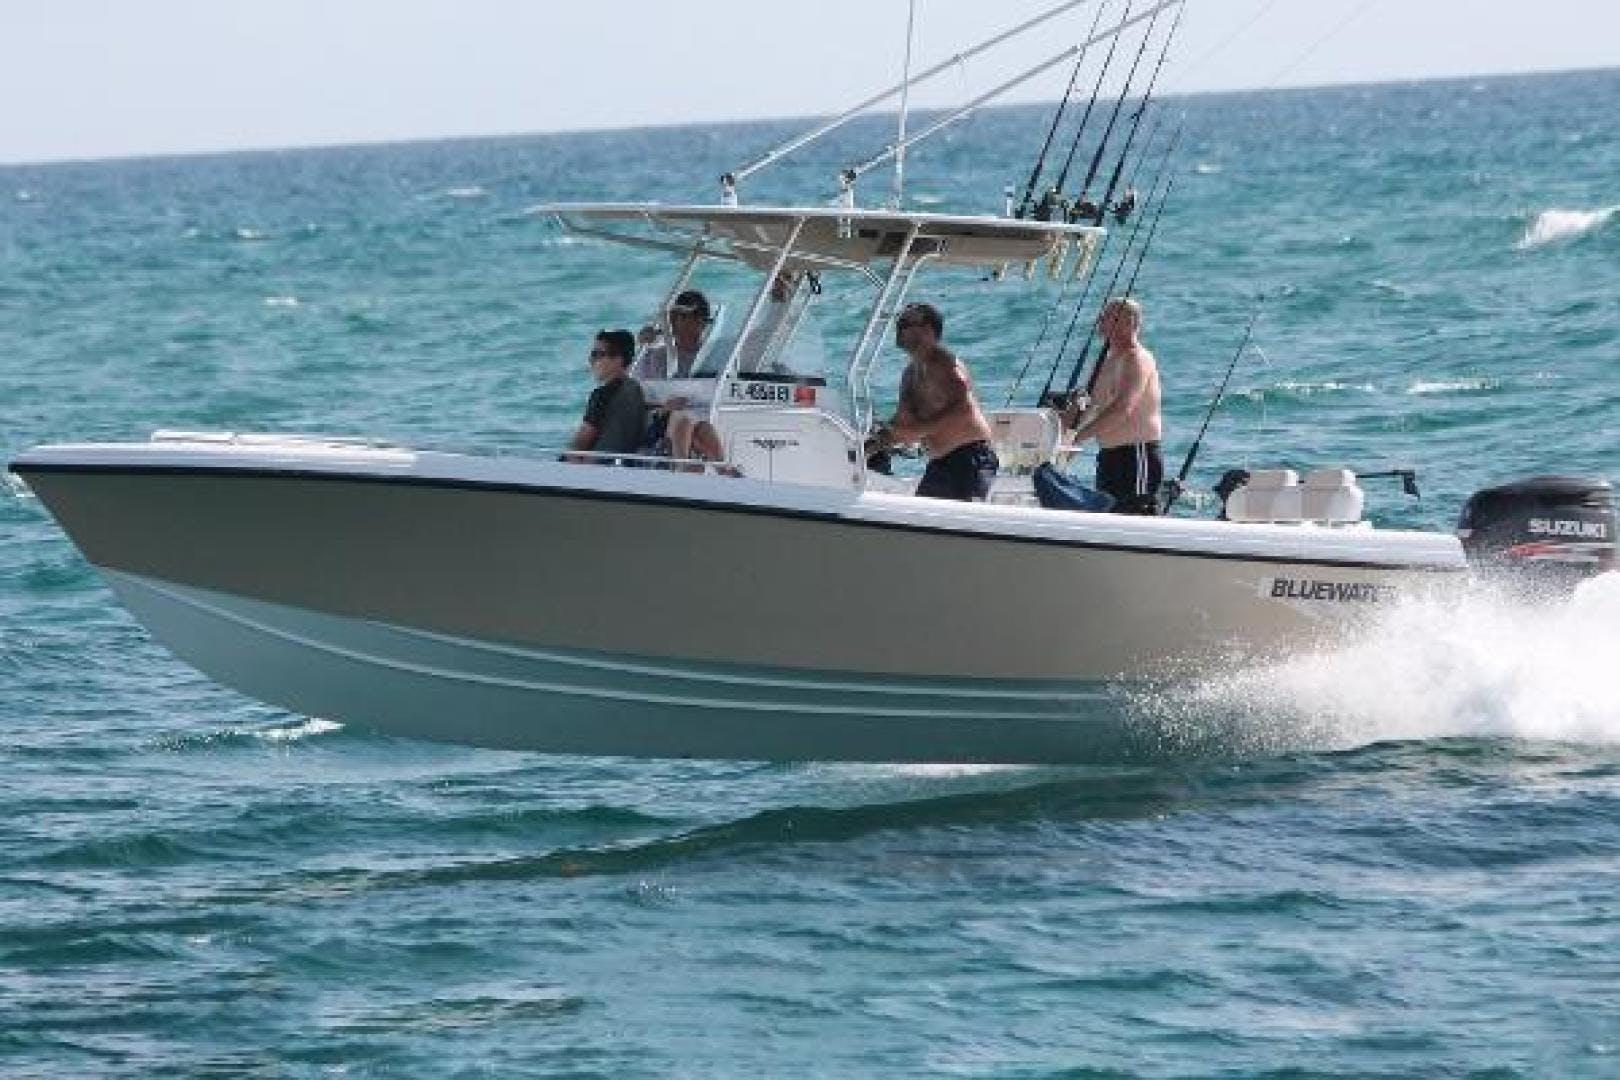 2020 Bluewater Sportfishing 24' 2550 Bluewater Sportfishing 2550   Picture 2 of 13